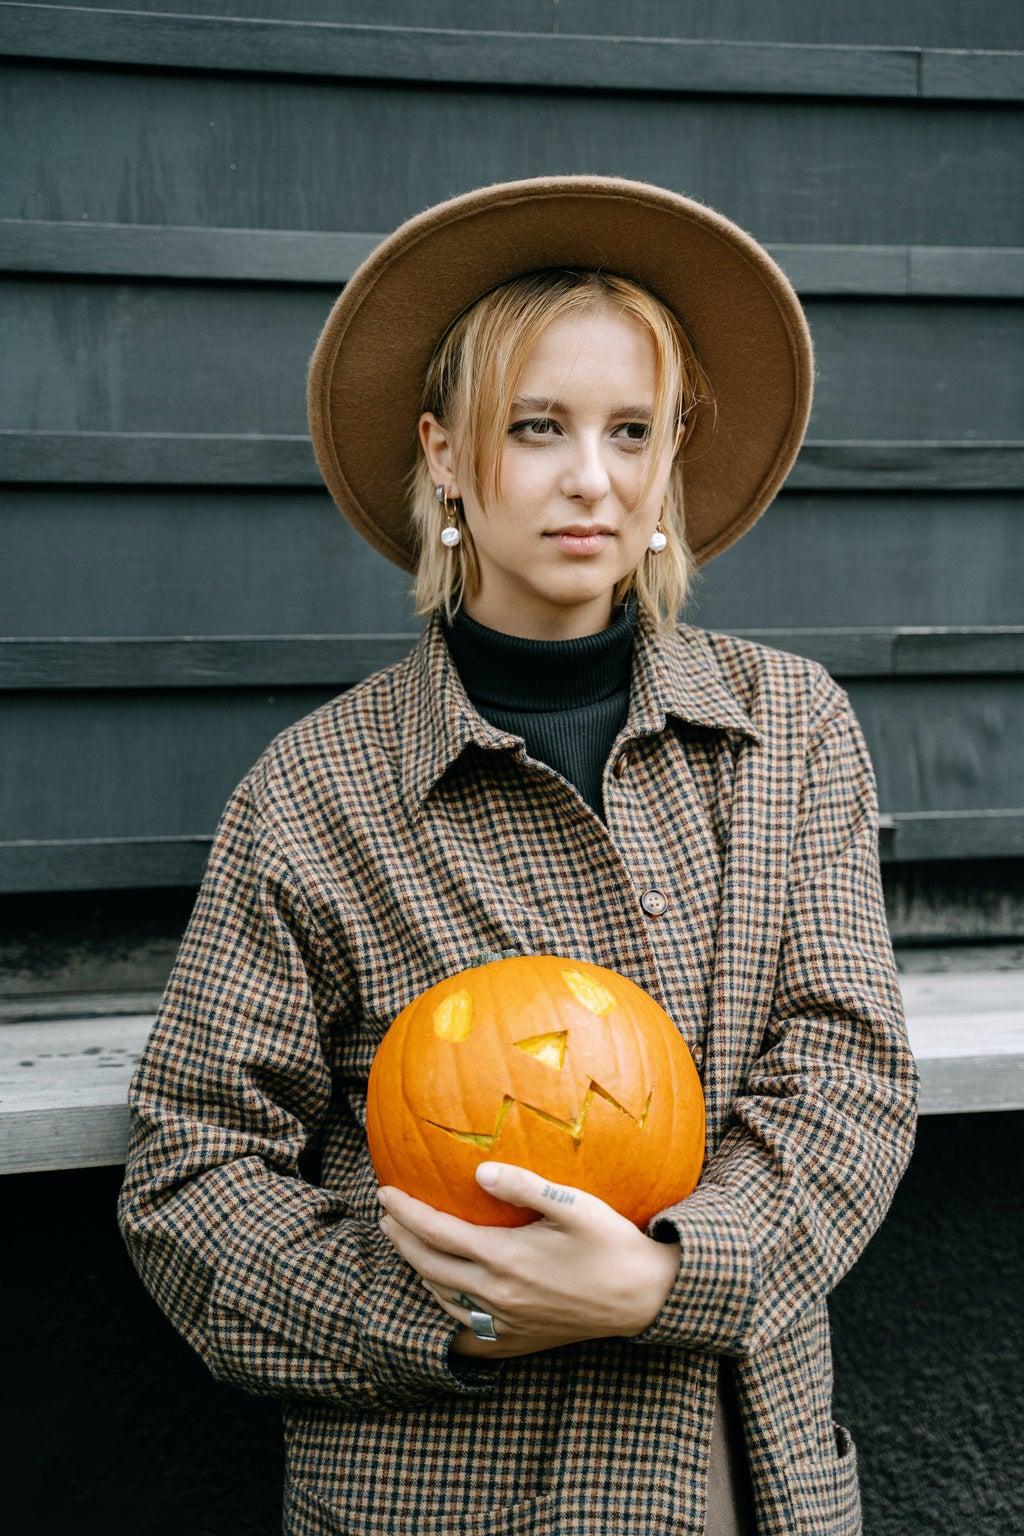 woman holding pumpkin and wearing fedora